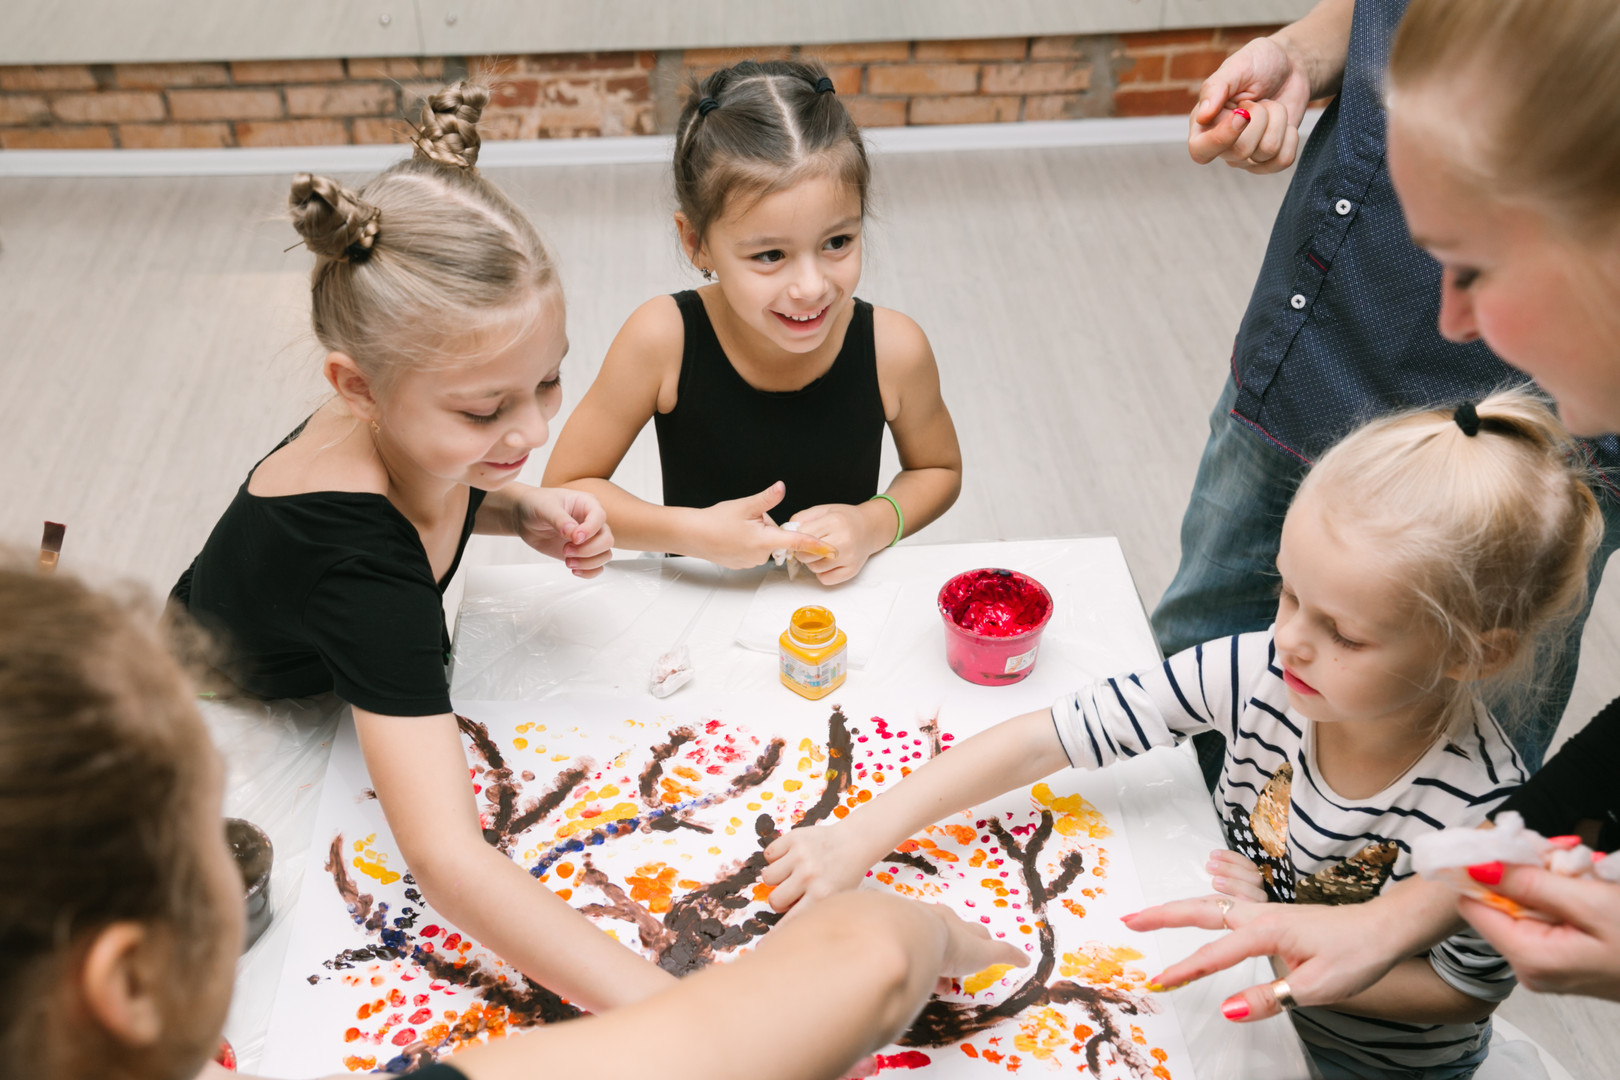 дети на живописи рисуют пальцами